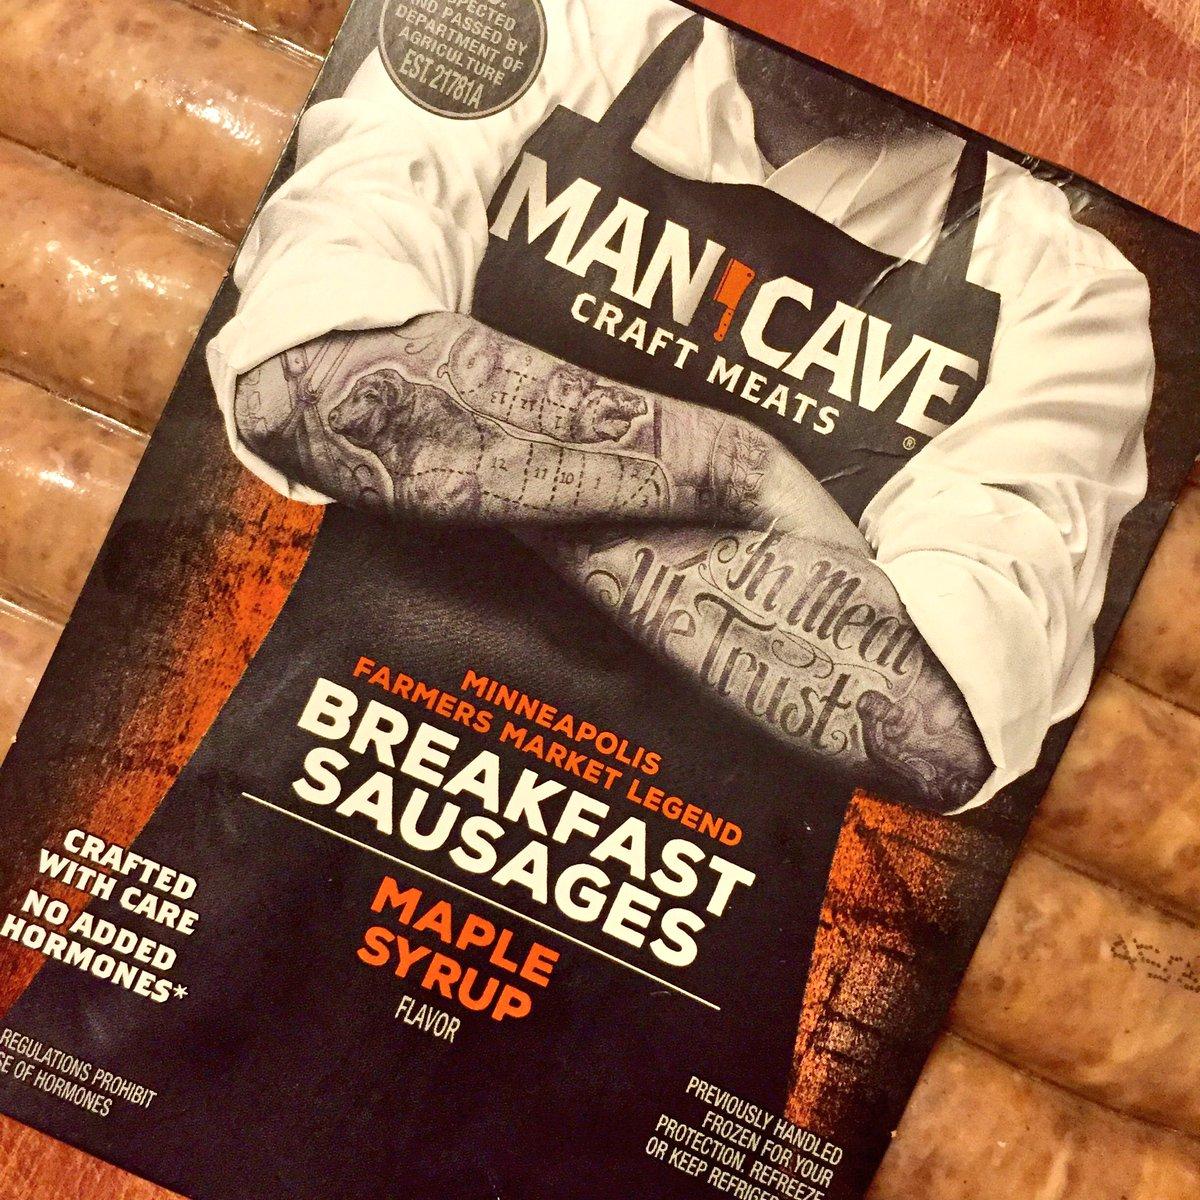 Man Cave Craft Eats Bratwurst : Dali castillo esoehh twitter